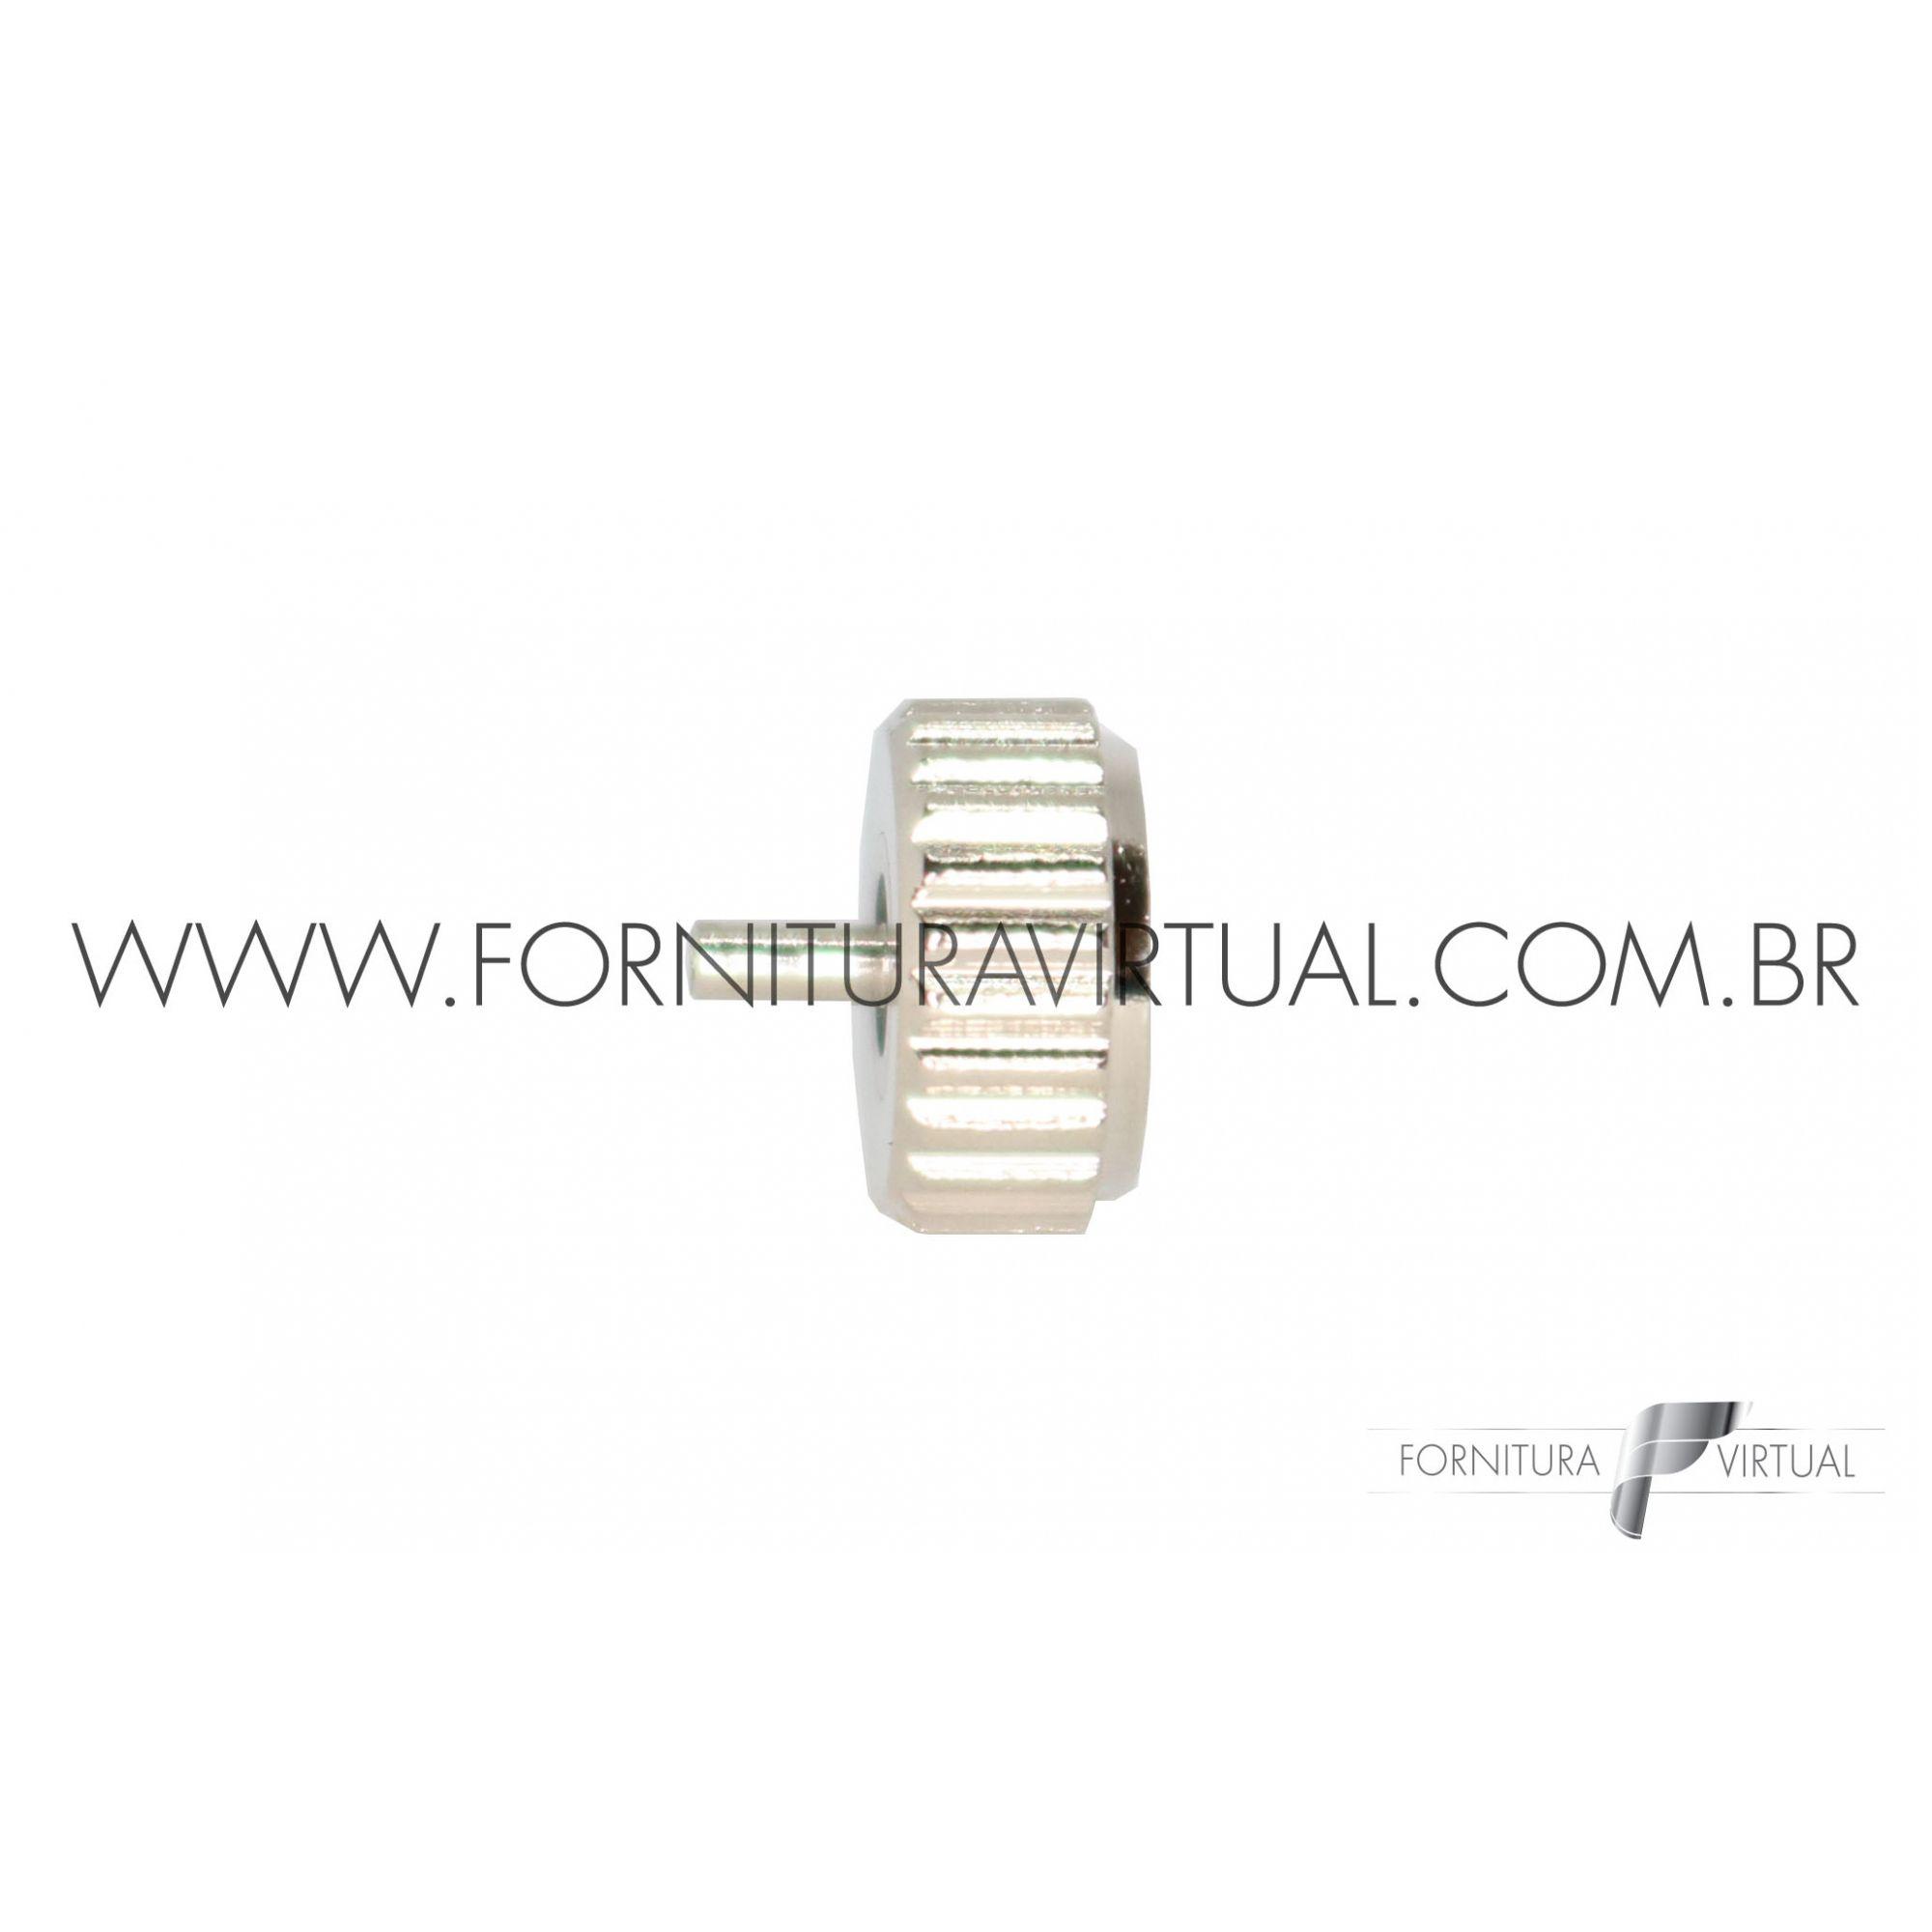 Coroa Capeada - 8.0 x 4.0 x 6.0 - Tubo 2.5